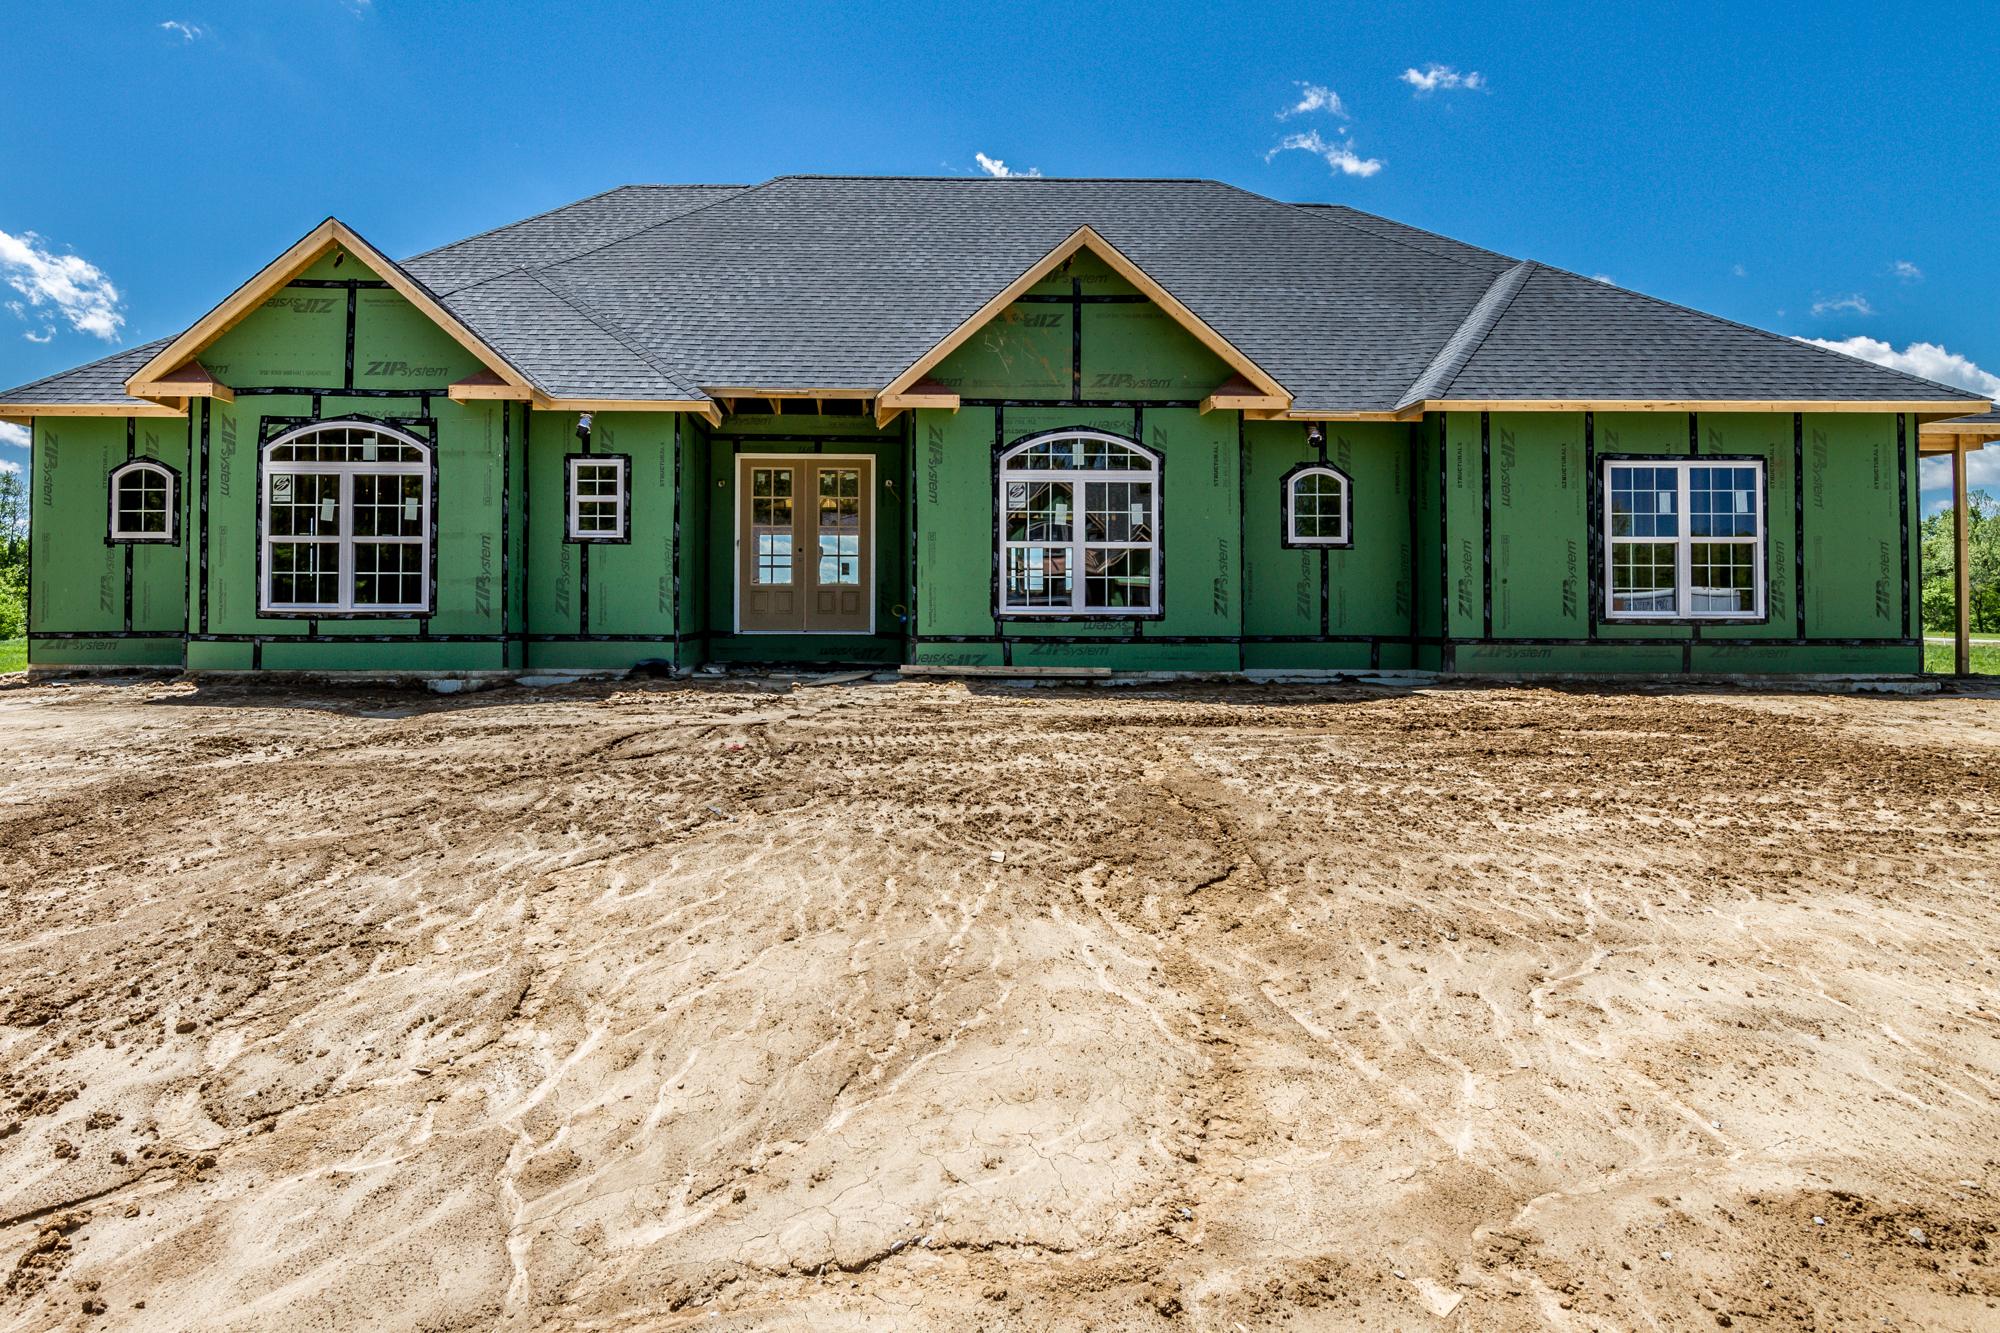 Bethel_Ridge_Farms_O'Fallon_Illinois_Progress_5.3.17-8.jpg